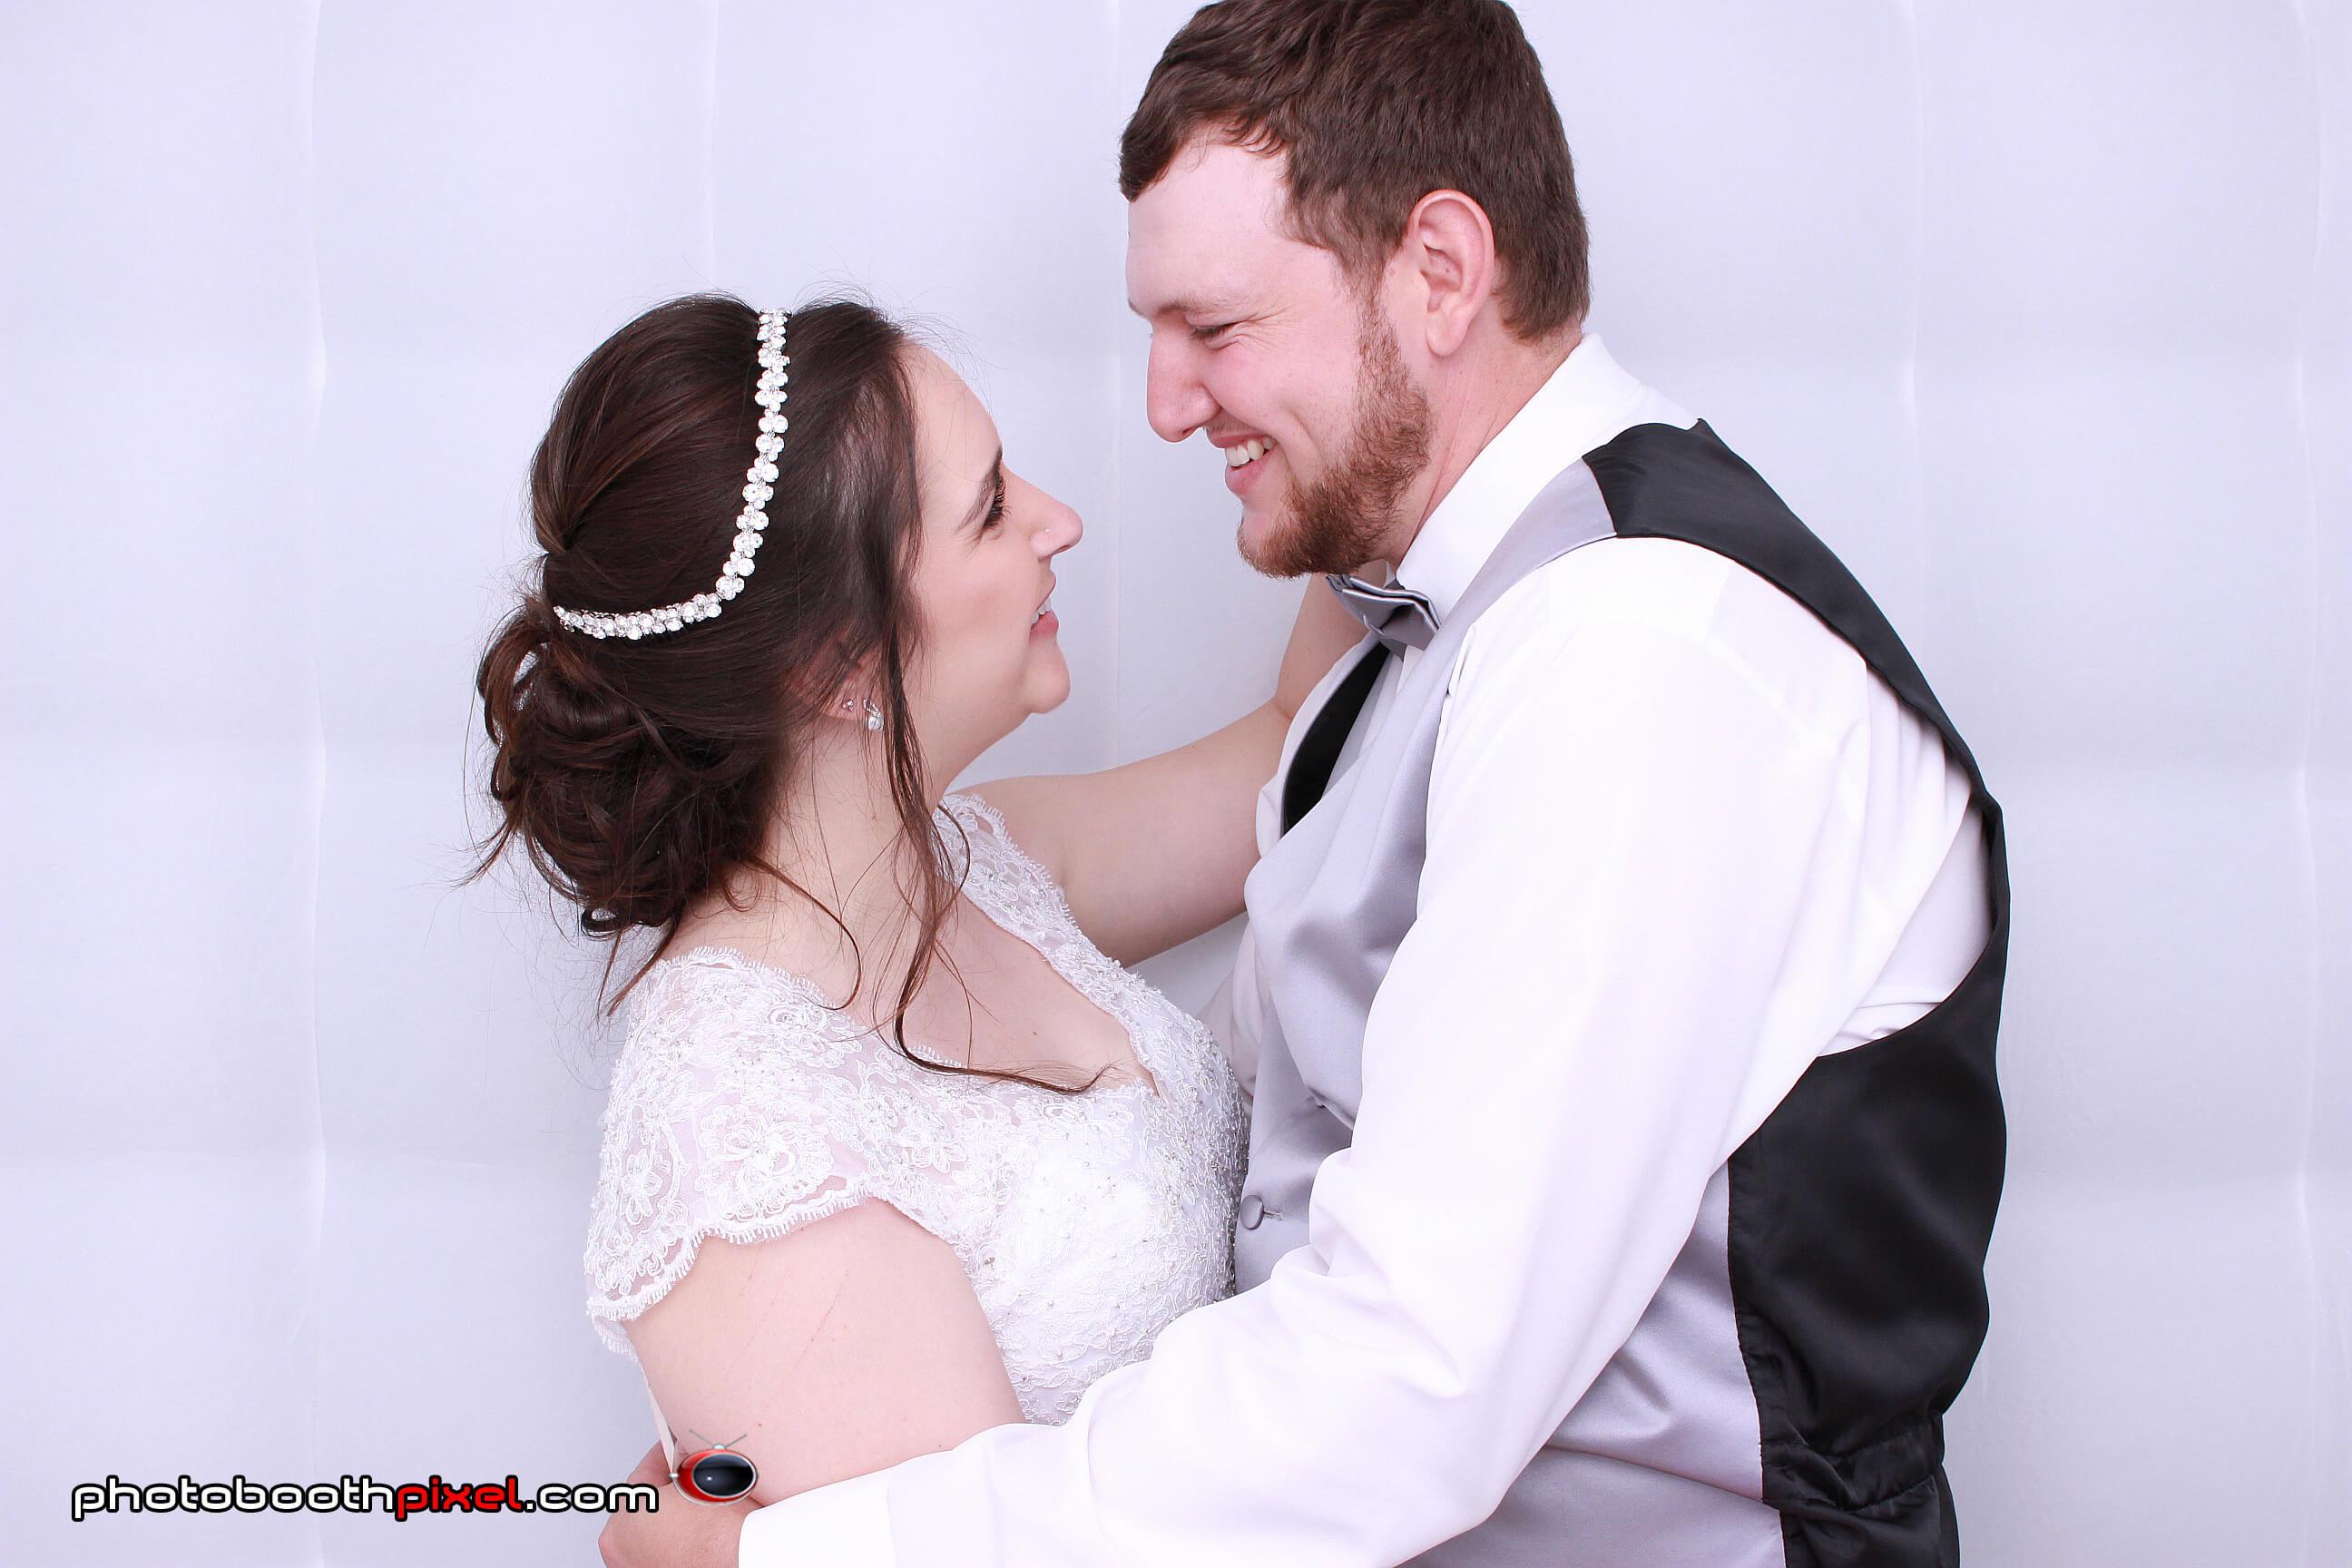 Wedding jacksonville fl for Beards jewelry jacksonville fl